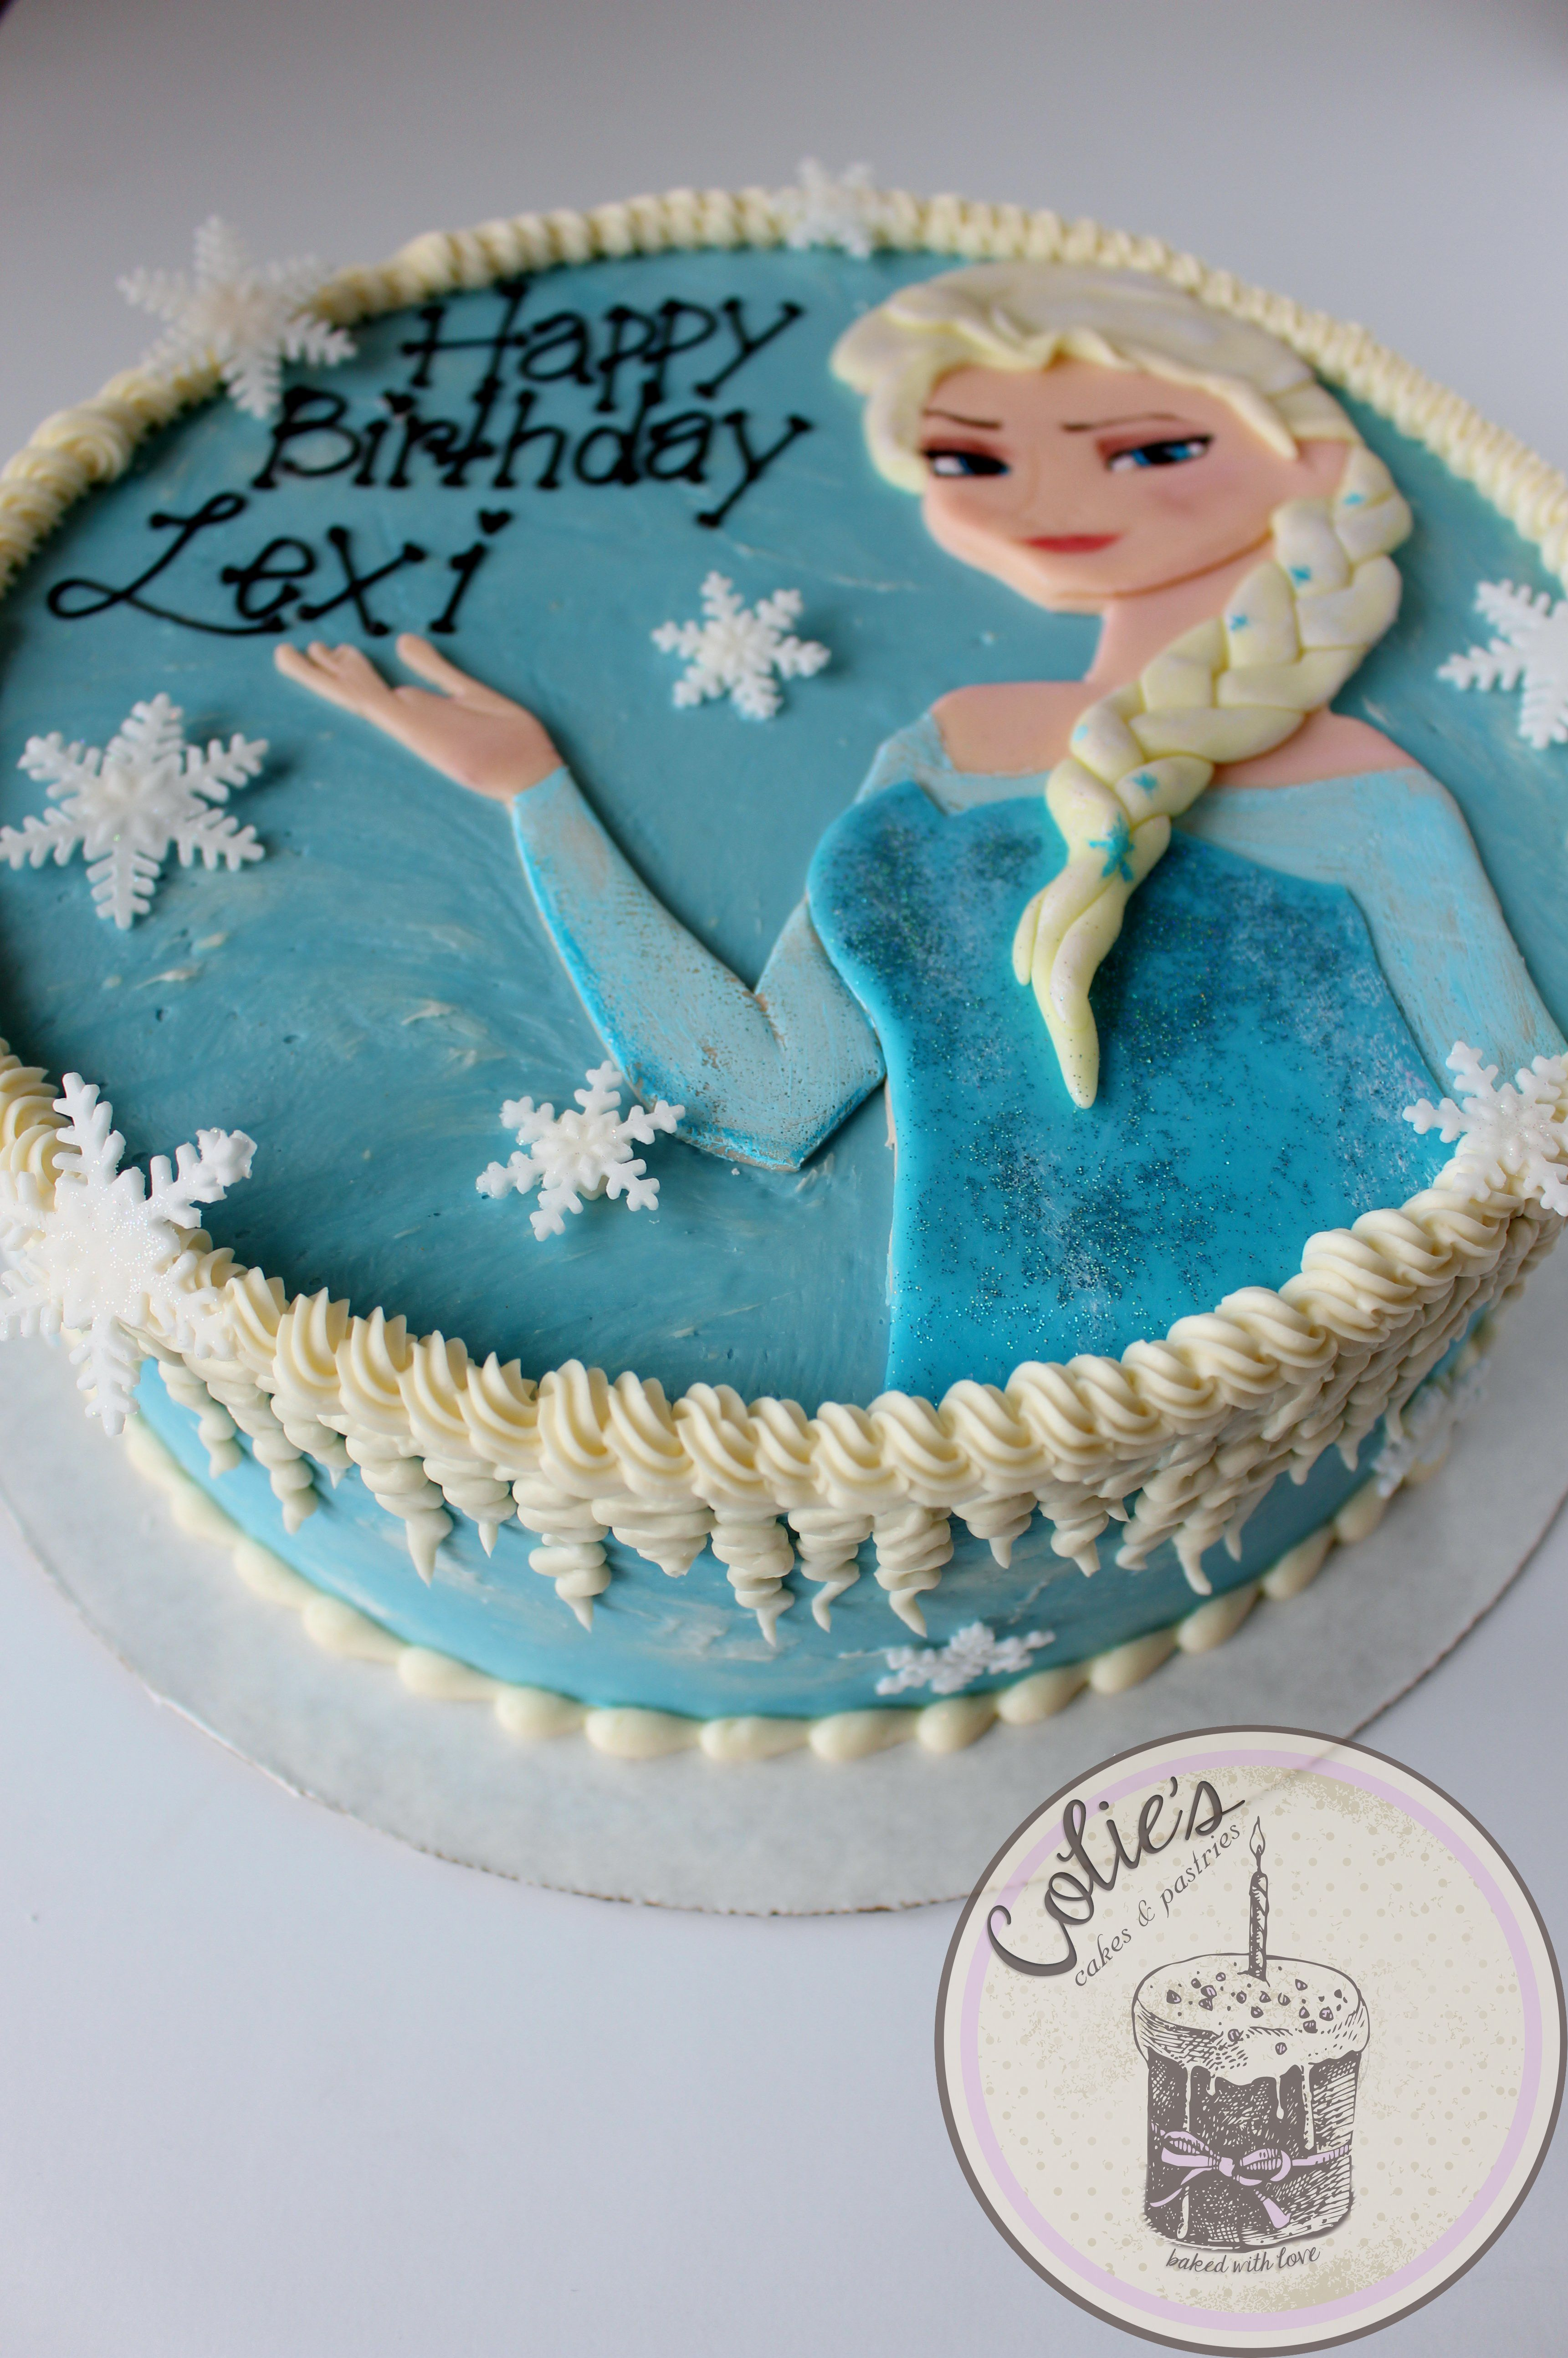 Stupendous Elsa From Frozen Cake Frozen Cake Frozen Theme Birthday Cake Birthday Cards Printable Benkemecafe Filternl